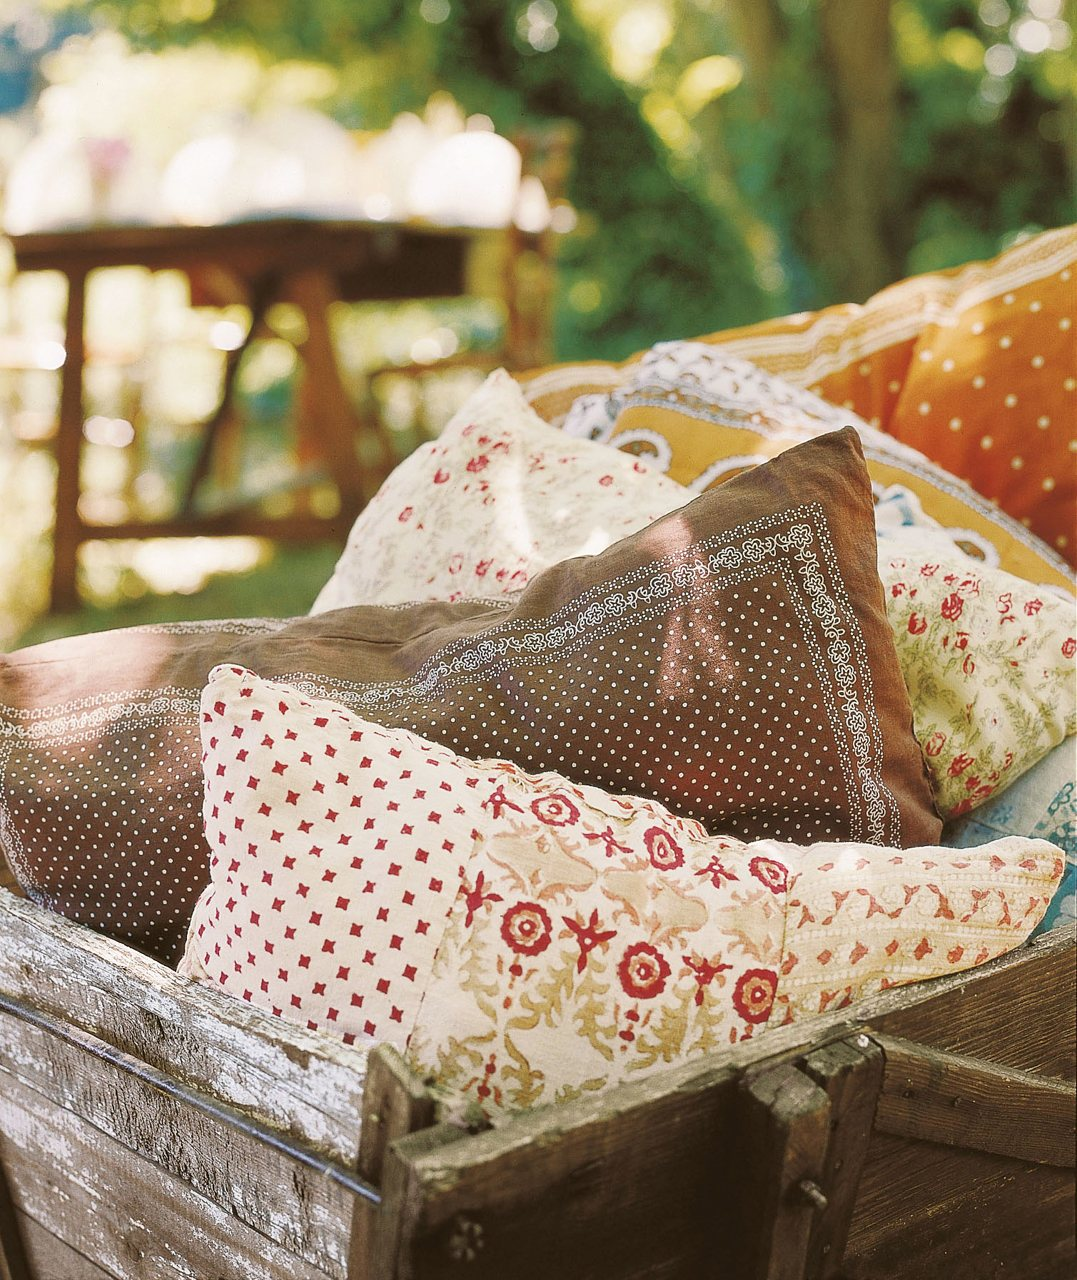 Cojines exteriores decoracion de exteriores muebles modernos rattan toldos sof de palets wengu - Cojines exterior ...